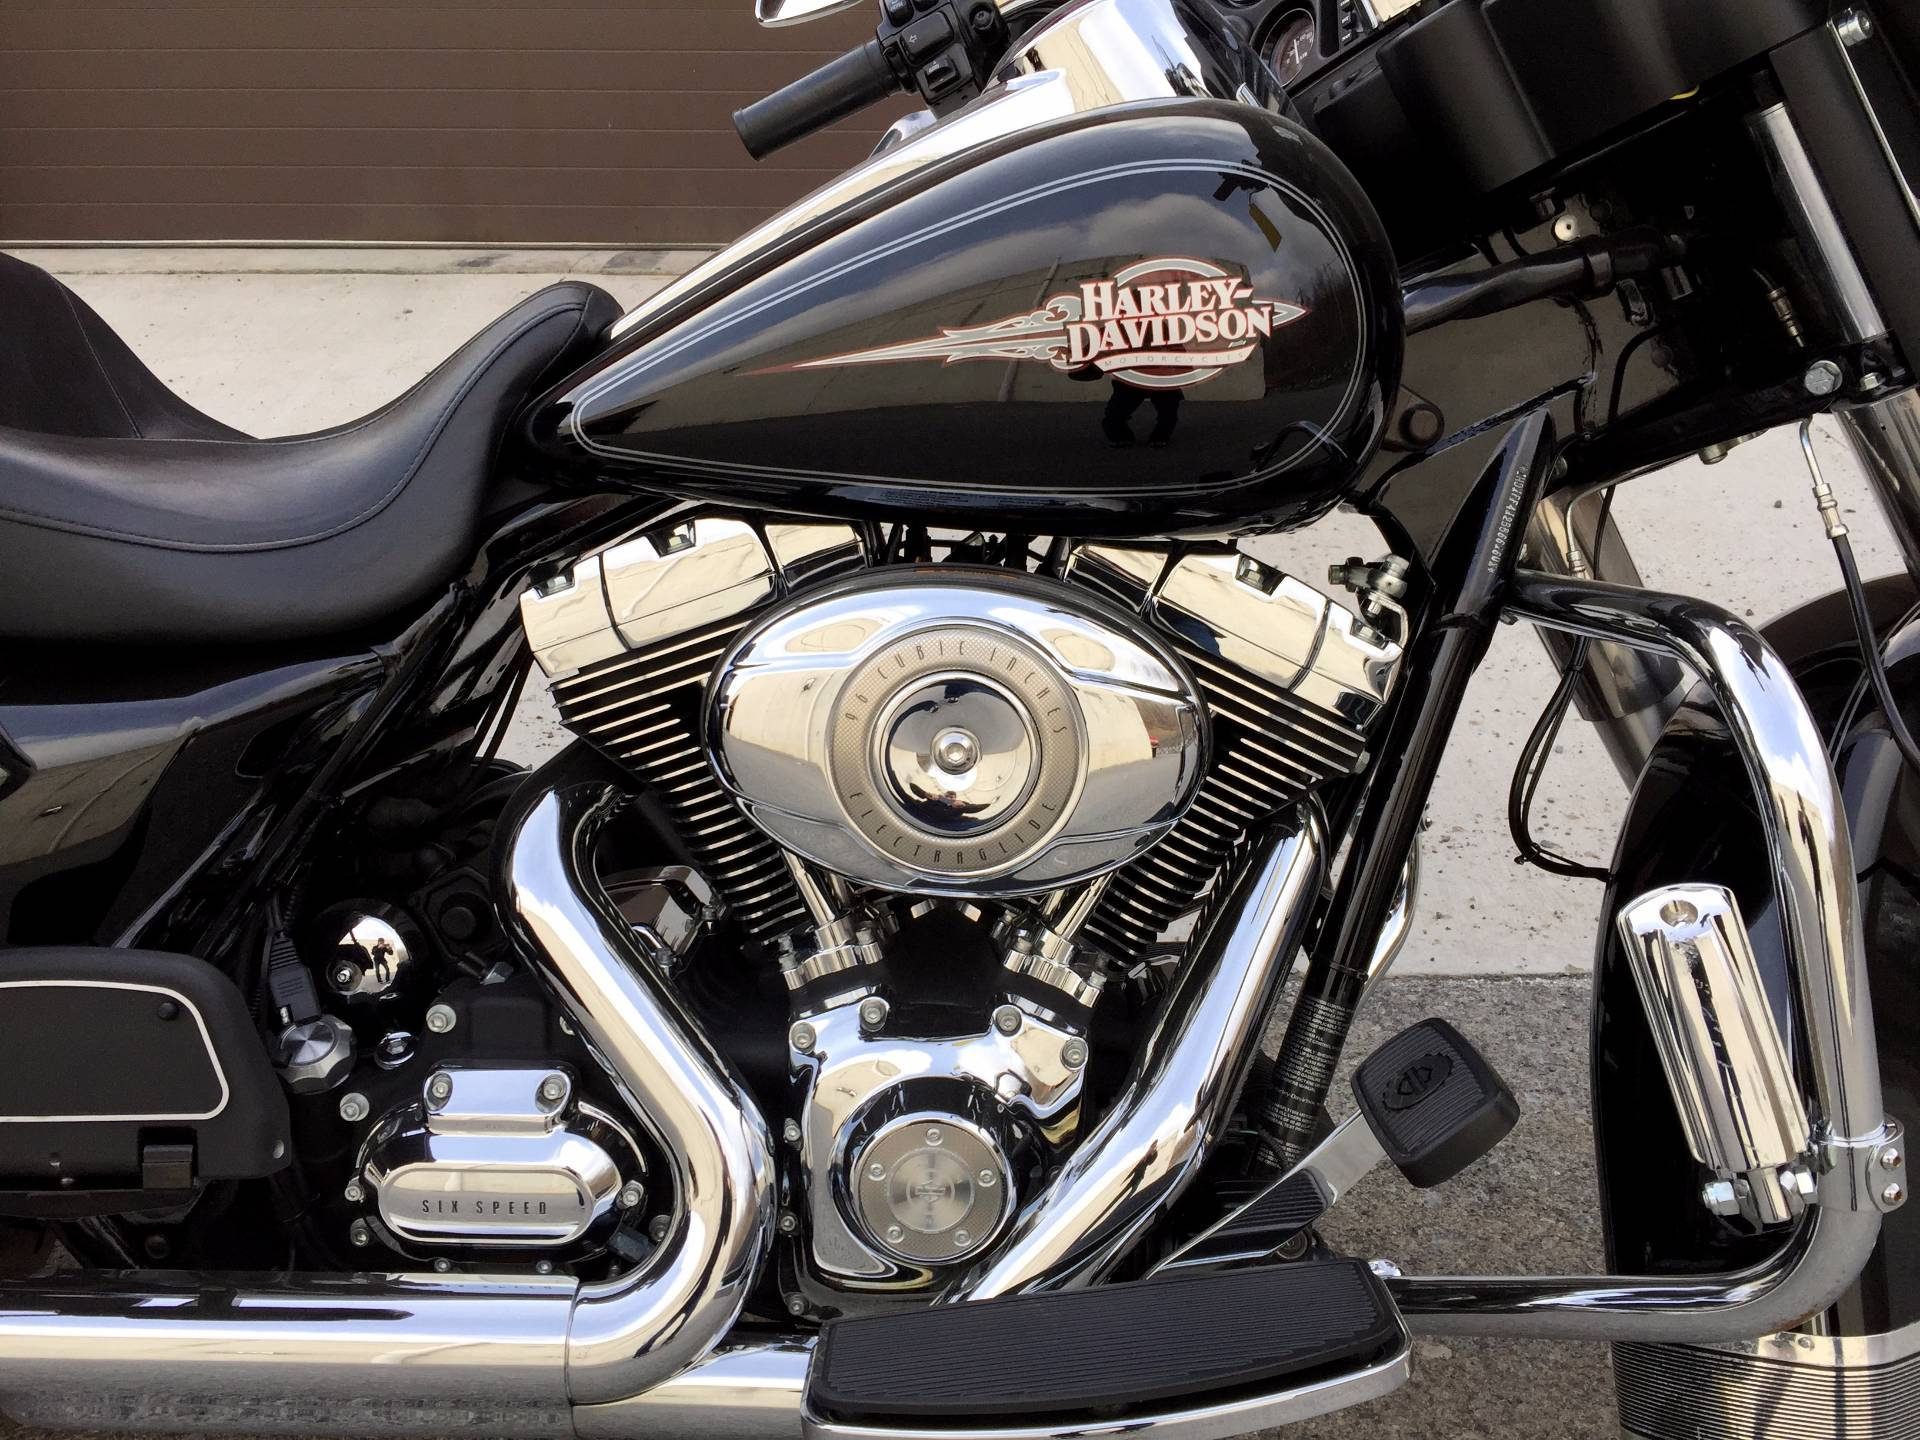 2011 Harley-Davidson Electra Glide® Classic in Tyrone, Pennsylvania